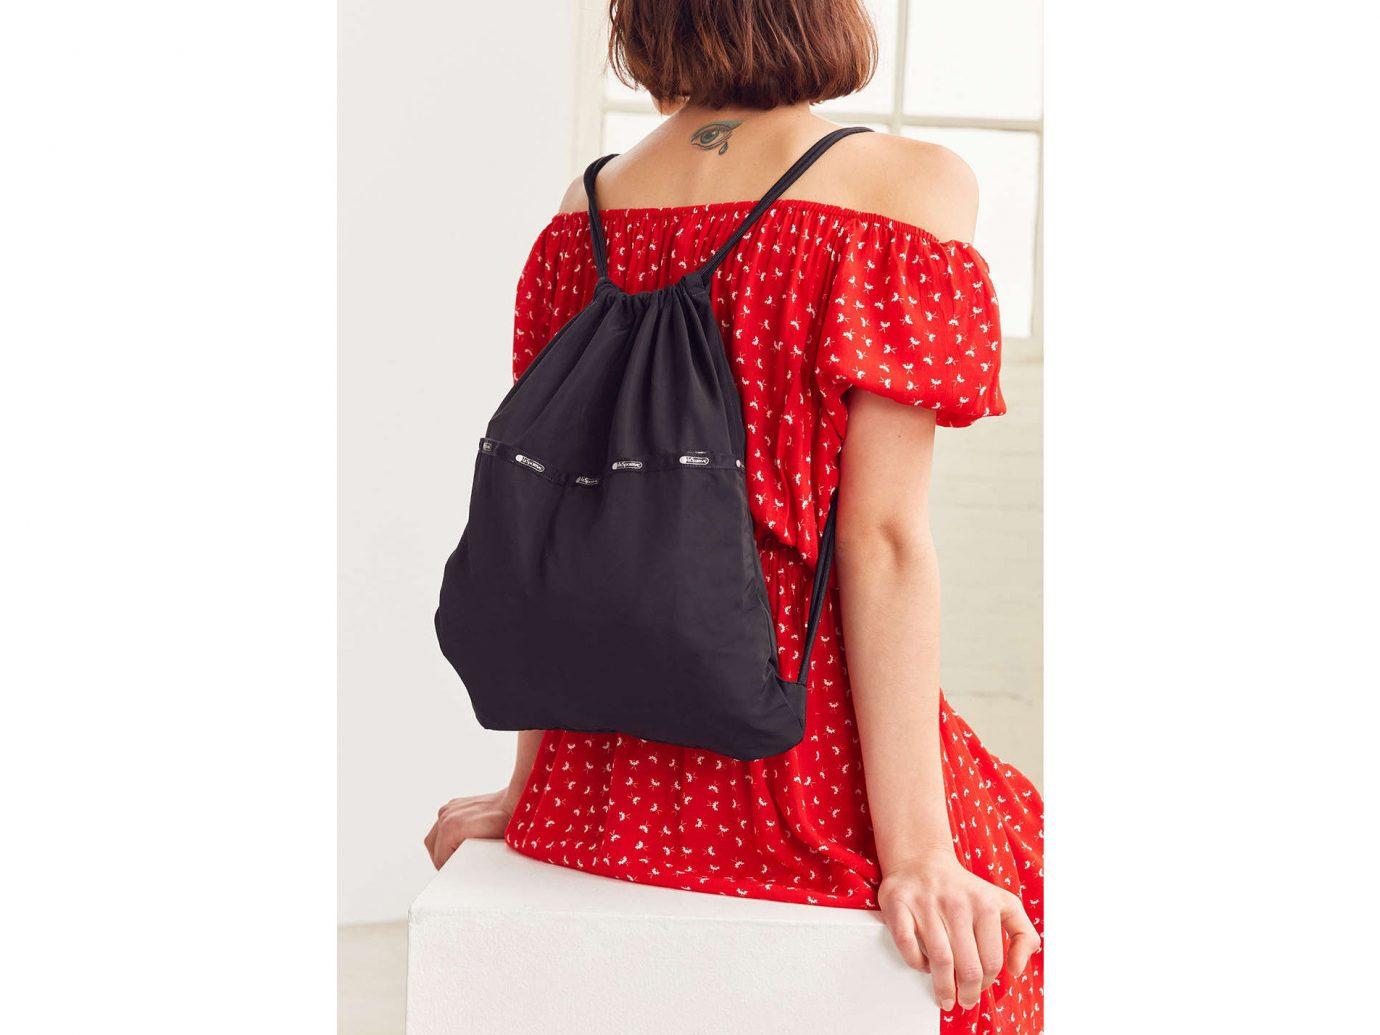 Style + Design red clothing indoor person shoulder polka dot bag Design joint pattern handbag product swimsuit top neck blouse sleeve tartan dressed